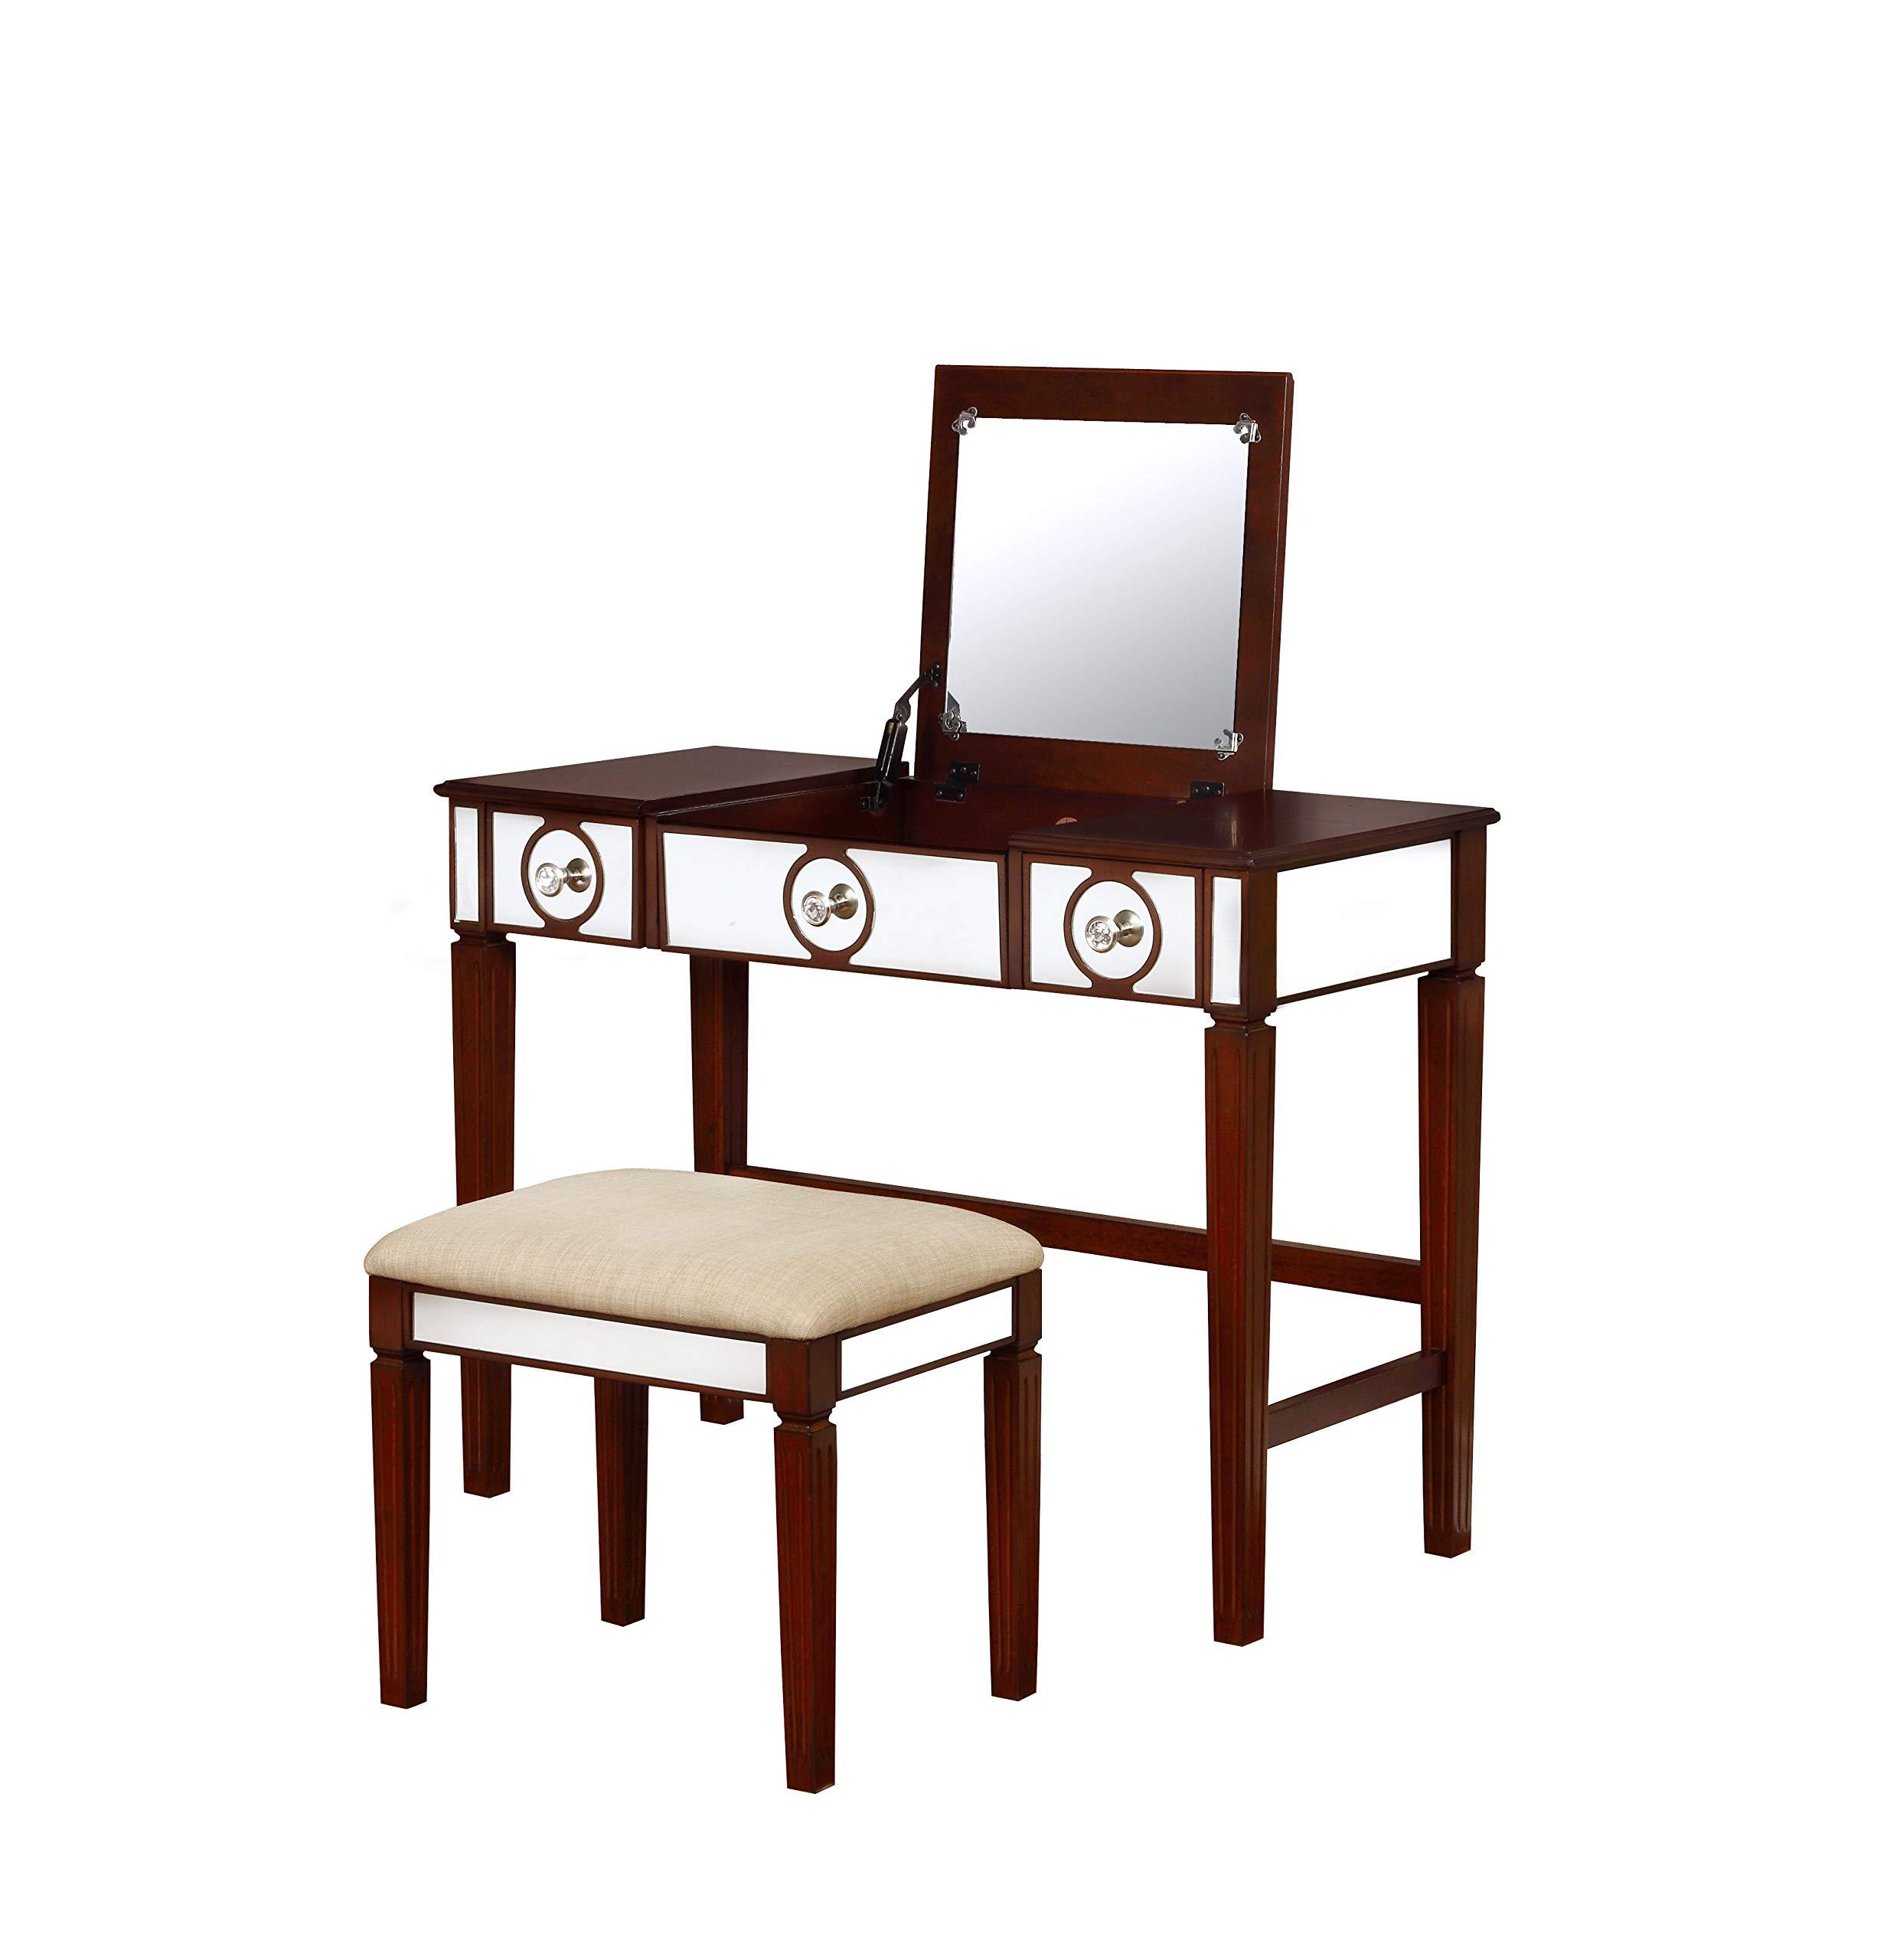 Benjara Wooden Vanity Set with Flip Top Mirror and Two Drawers, Brown and Beige